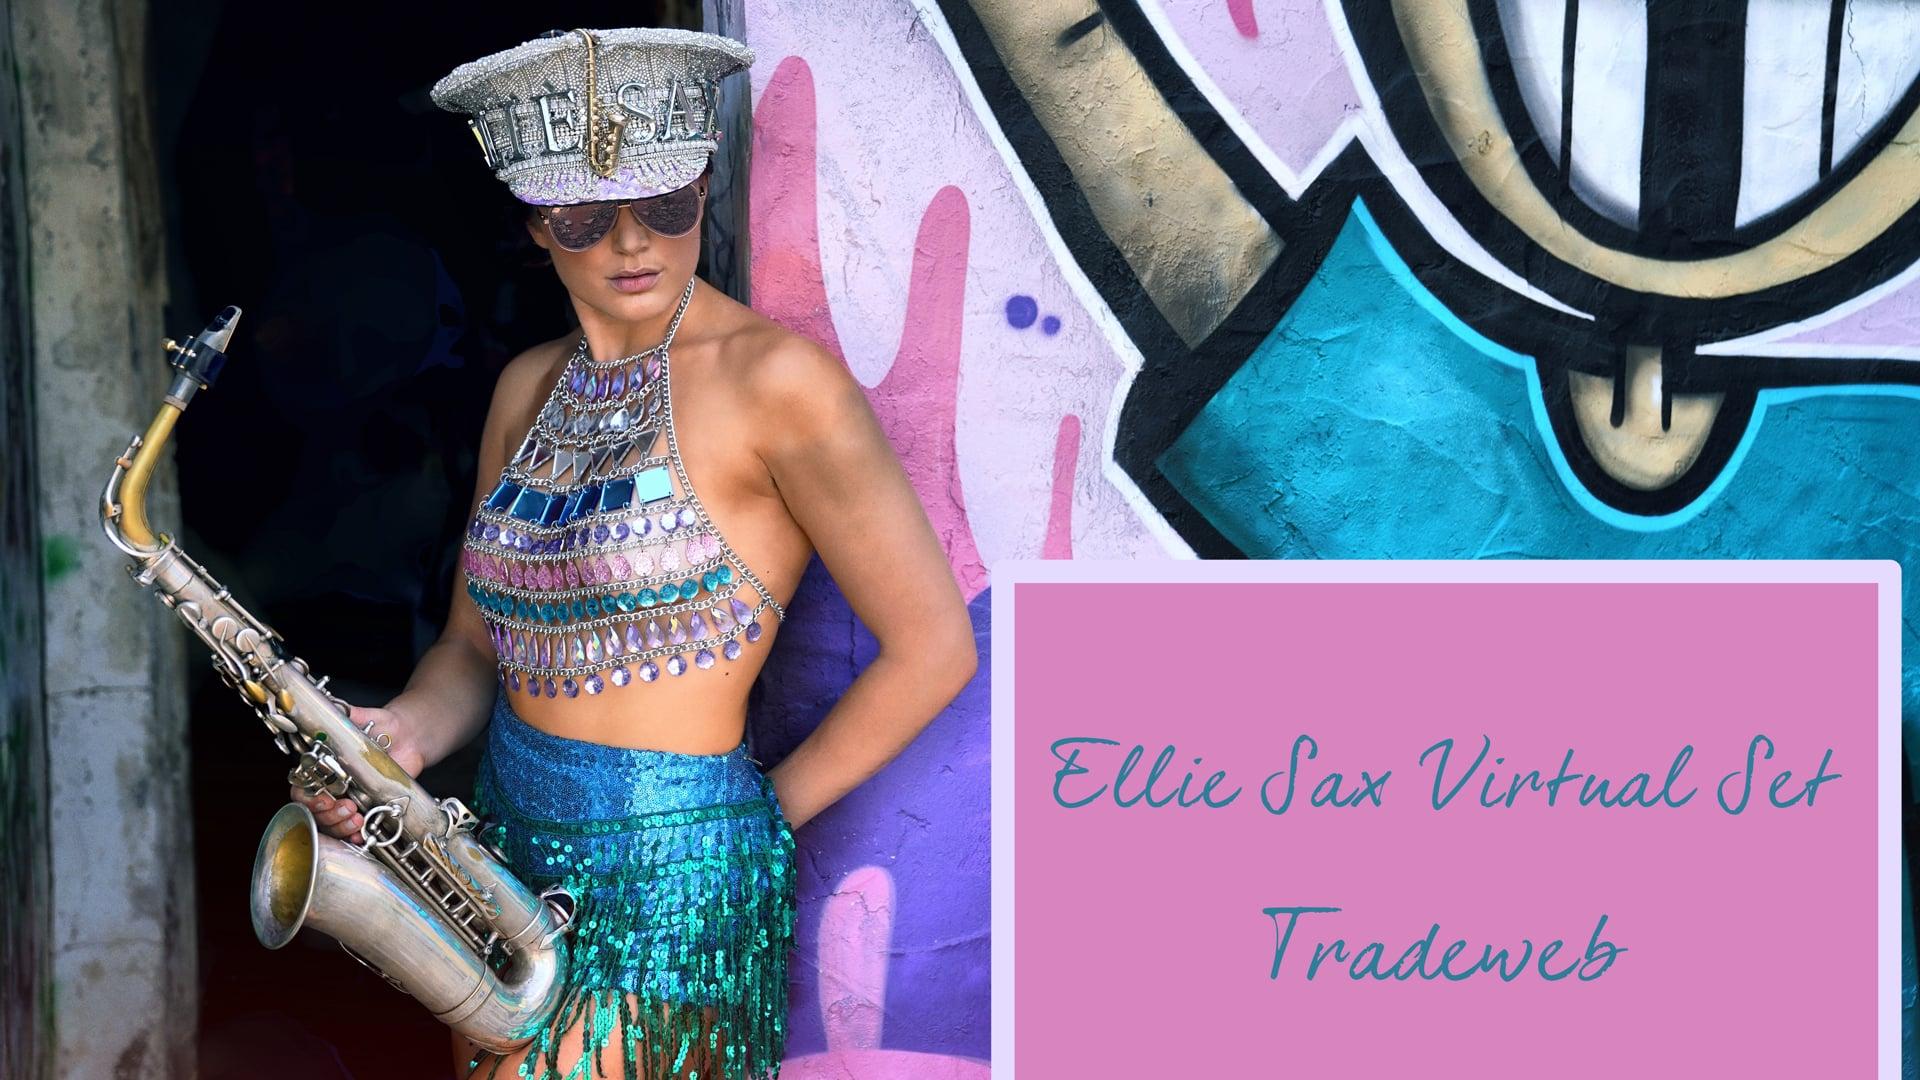 Ellie Sax Trade Web Stream - Live From Ibiza